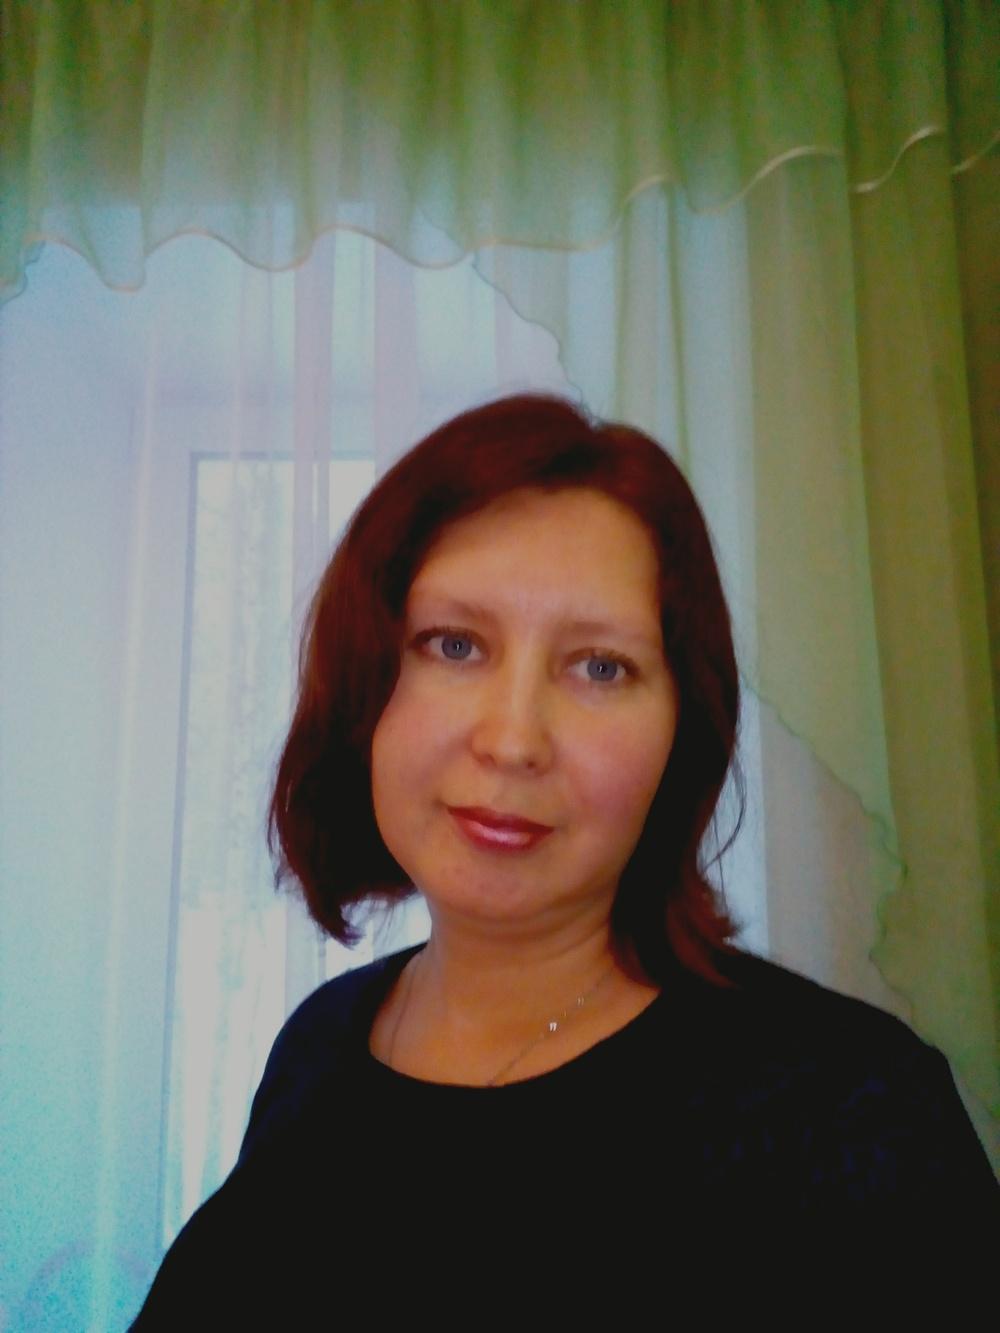 Знакомства с инегороднеми девушкеми в москве